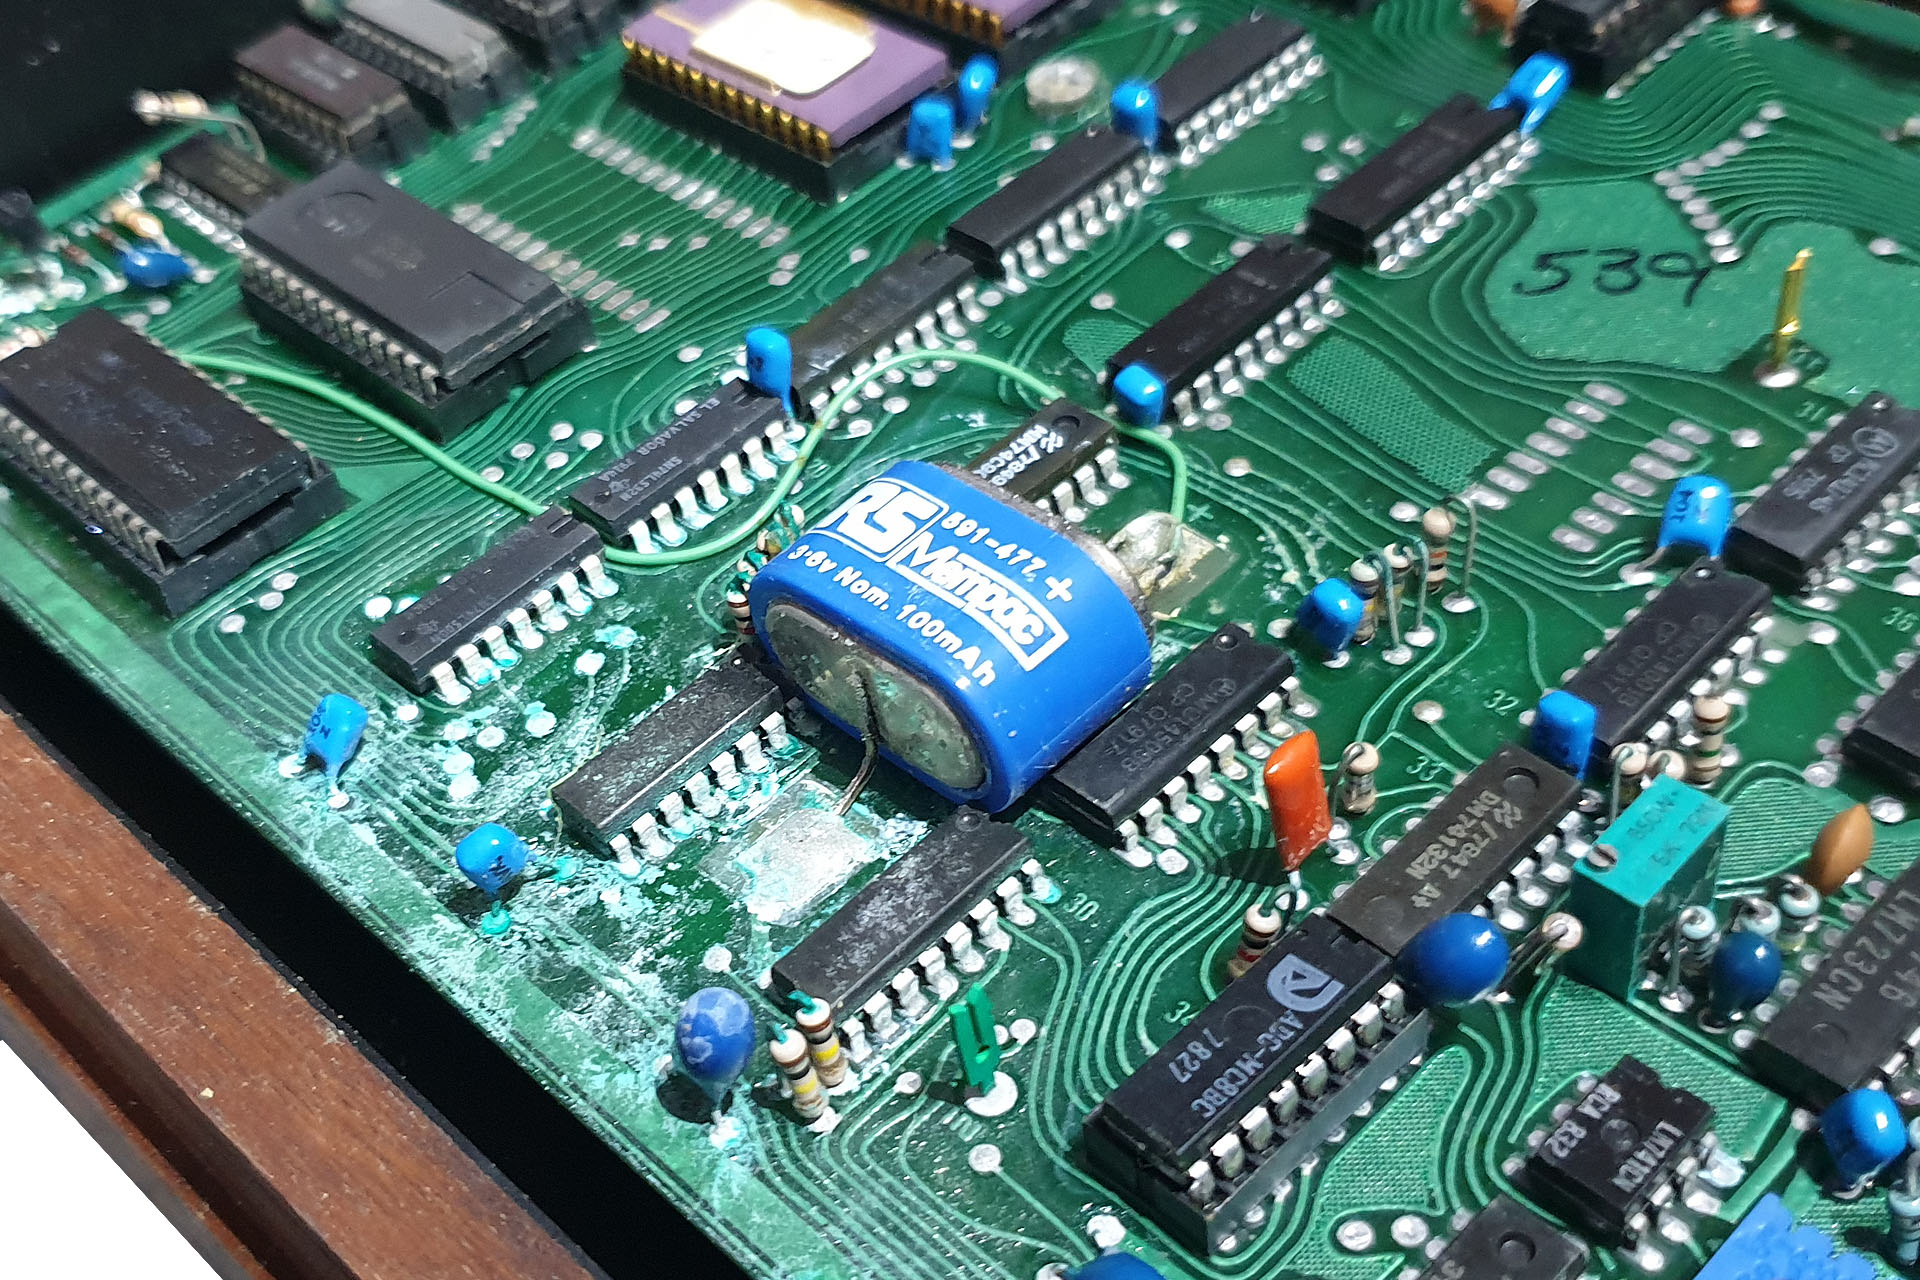 Battery Acid Damage in Prophet 5 2 (2020.12.16)